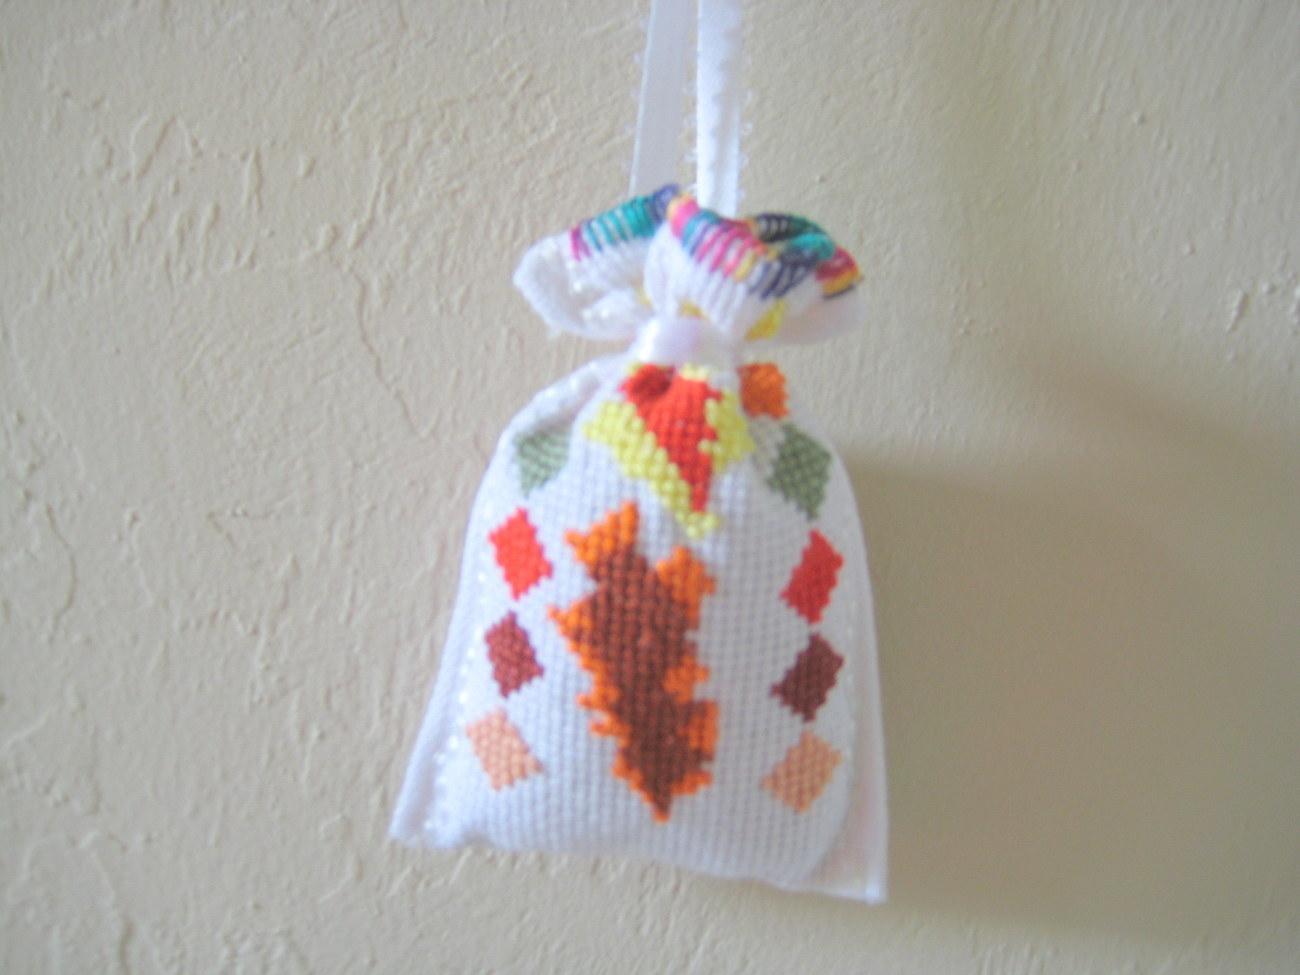 "Satchel Lavender Sack 3""x3"" needlepoint Set of 4 Unique Gift Idea or Deco image 3"